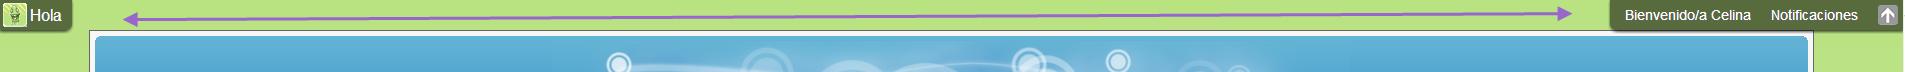 Trucos/astucias para modificar la Toolbar Tool6711